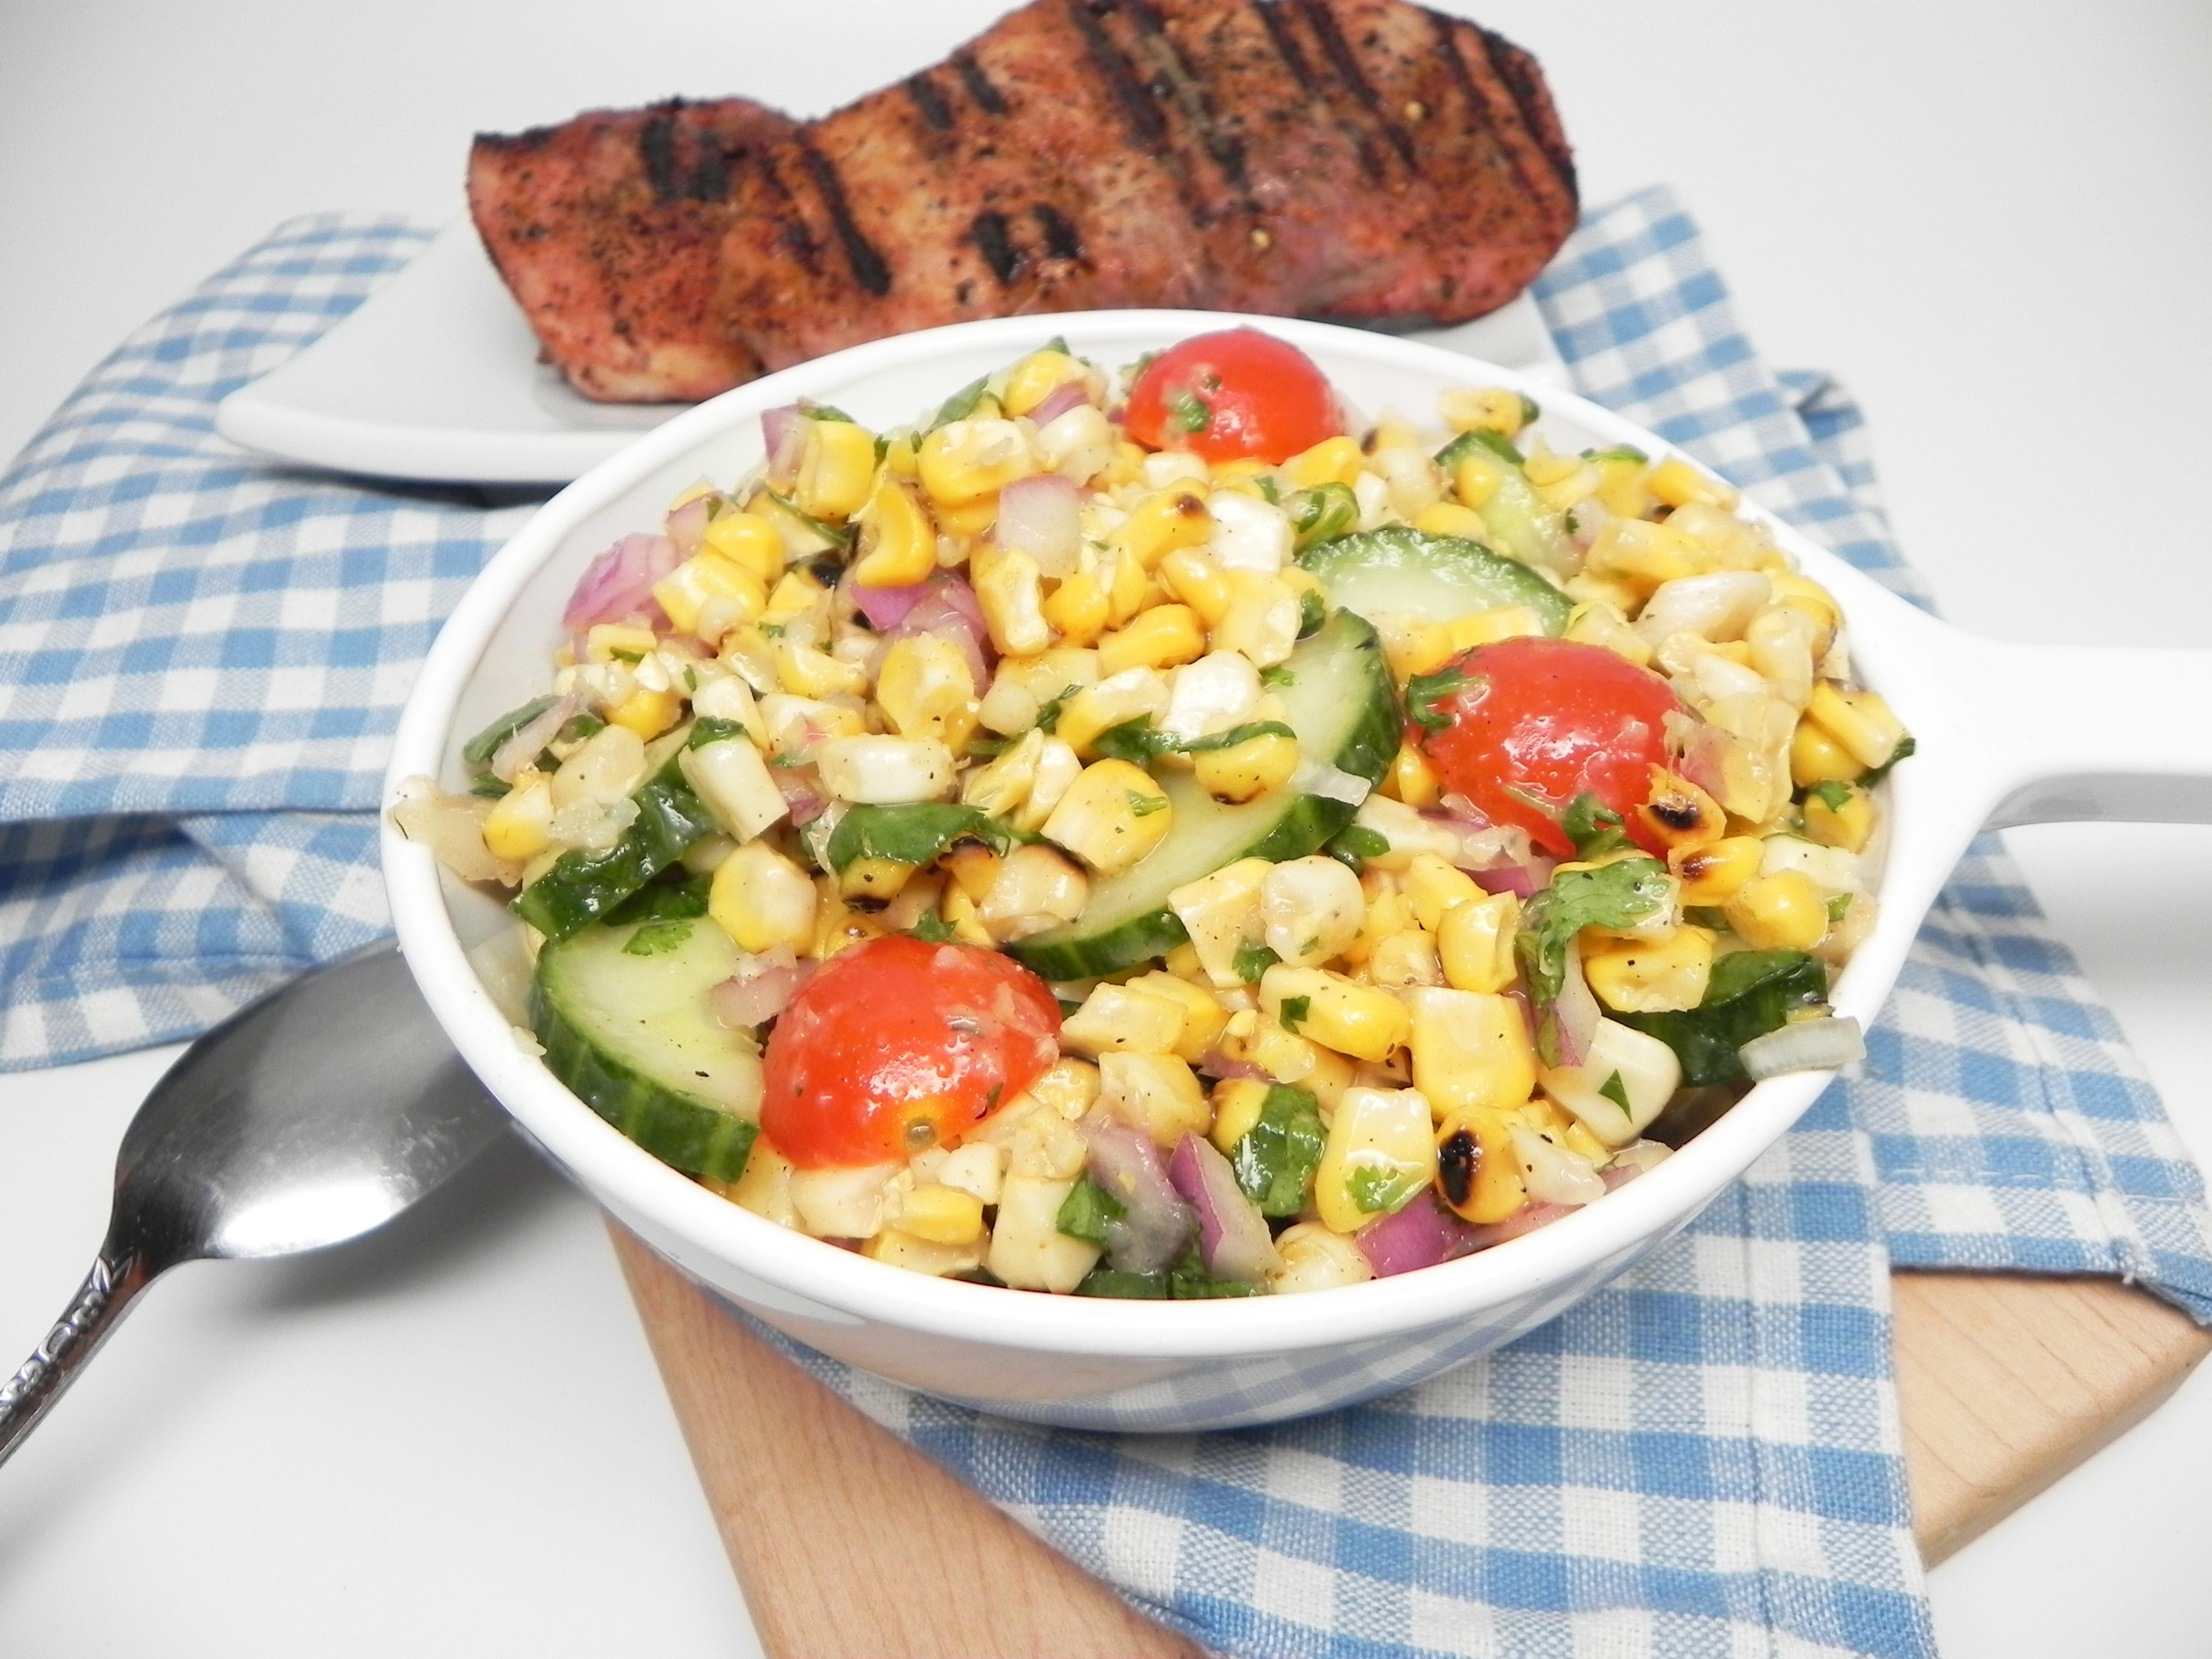 Nicole's Grilled Corn Salad